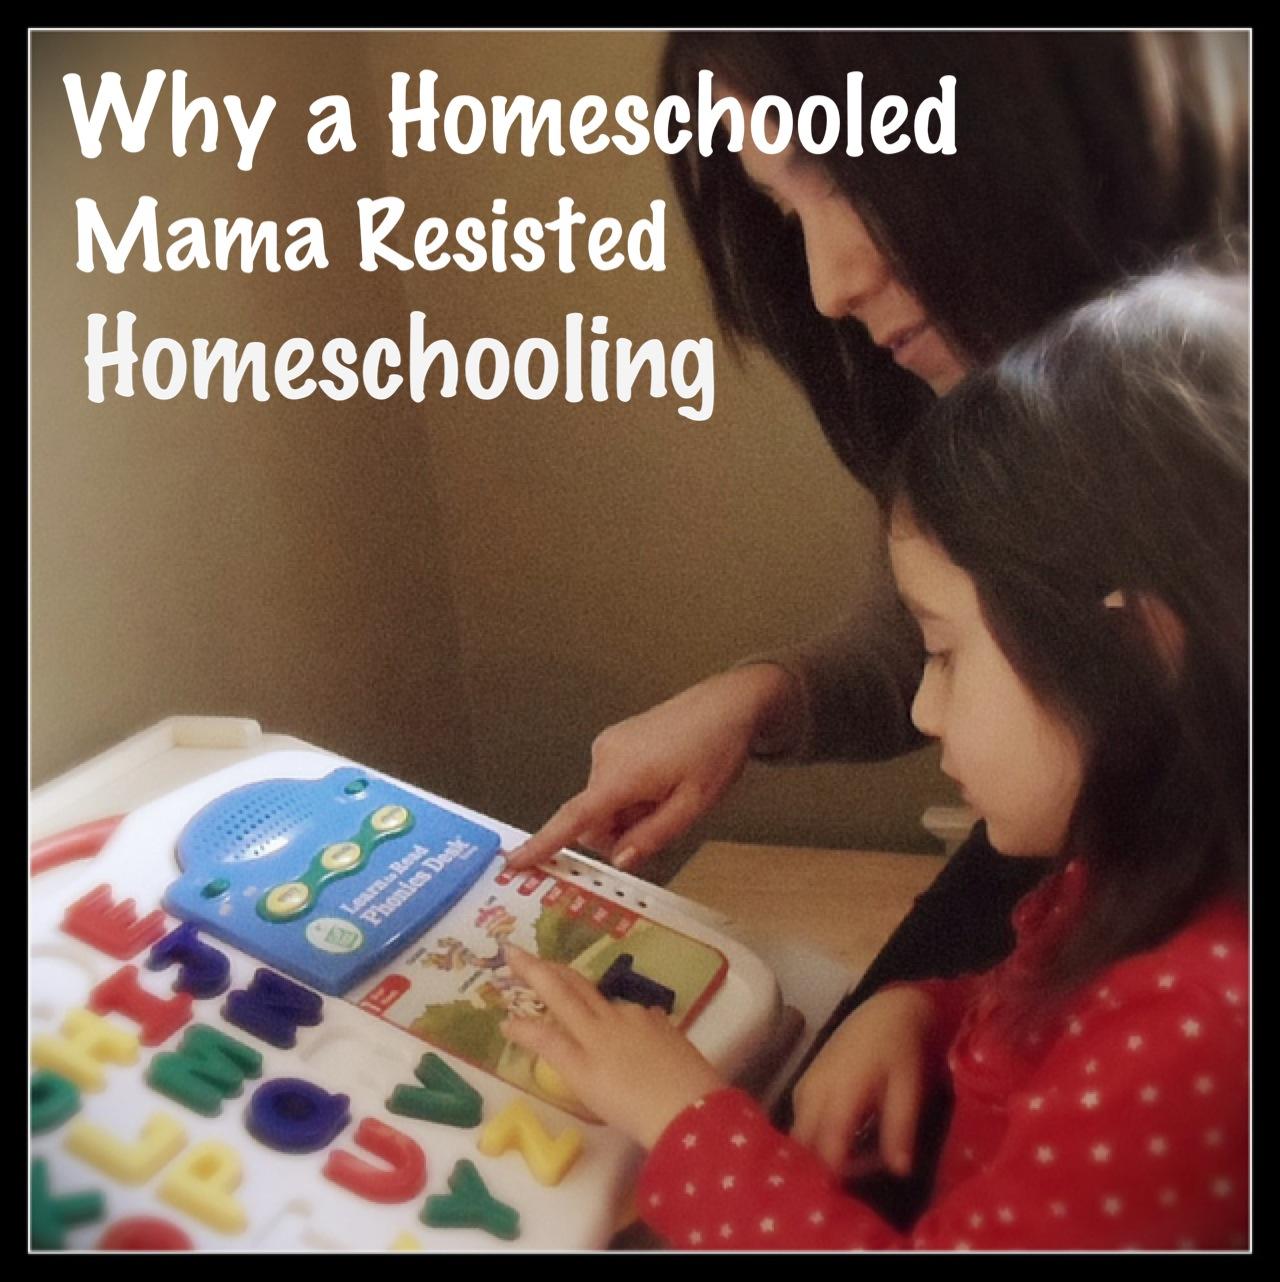 Why a Homeschooled Mama Resisted Homeschooling